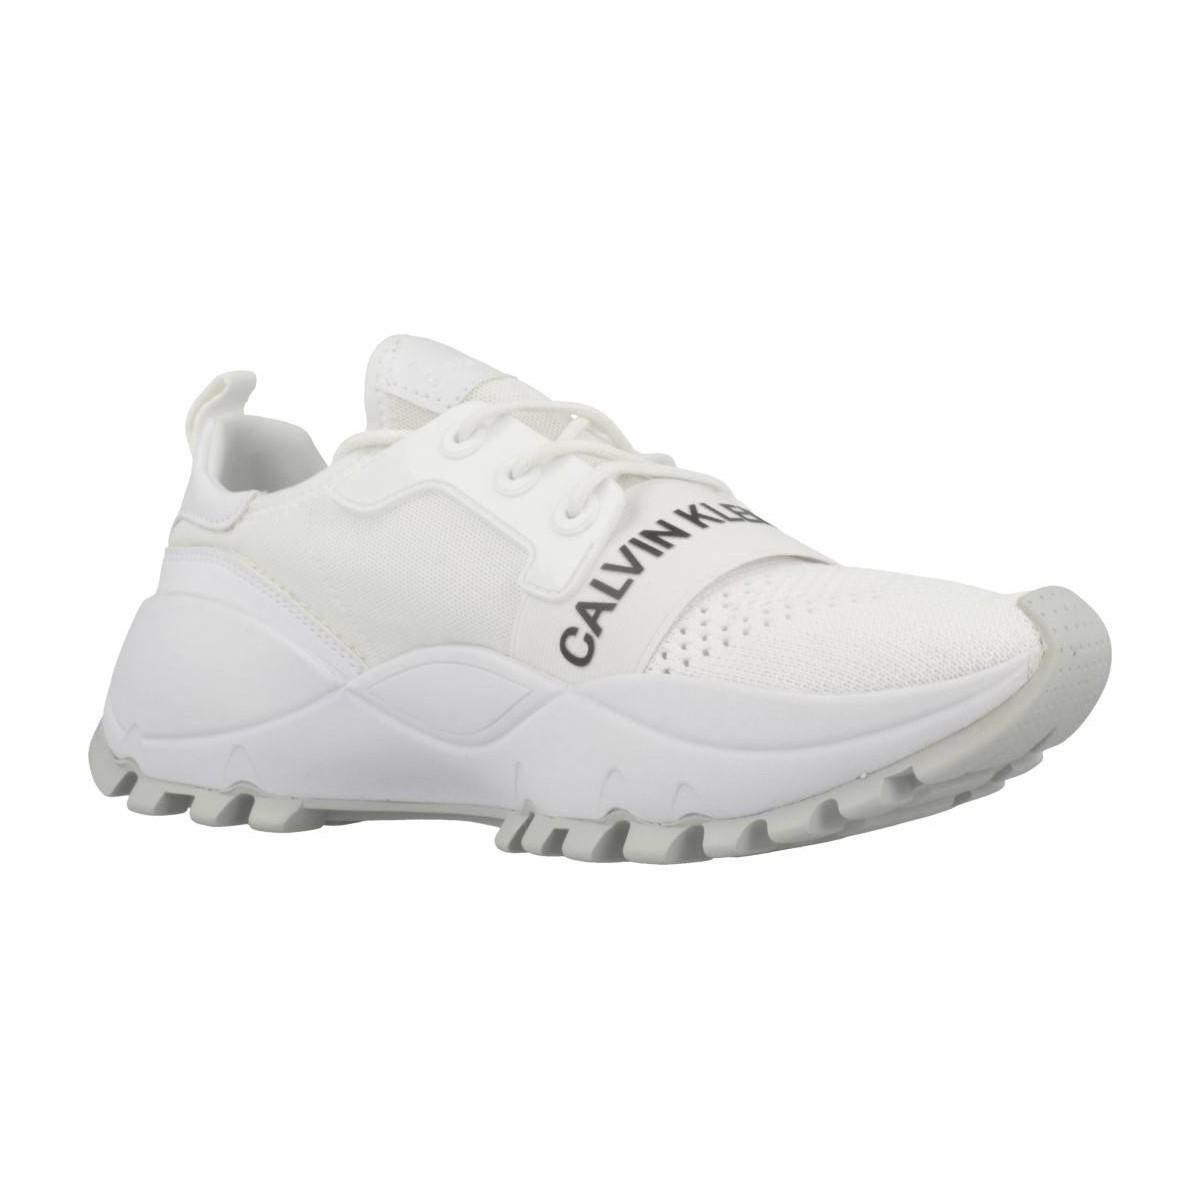 9cea4f5db11 Lyst - TALULA KNIT MESH femmes Chaussures en blanc Calvin Klein en ...